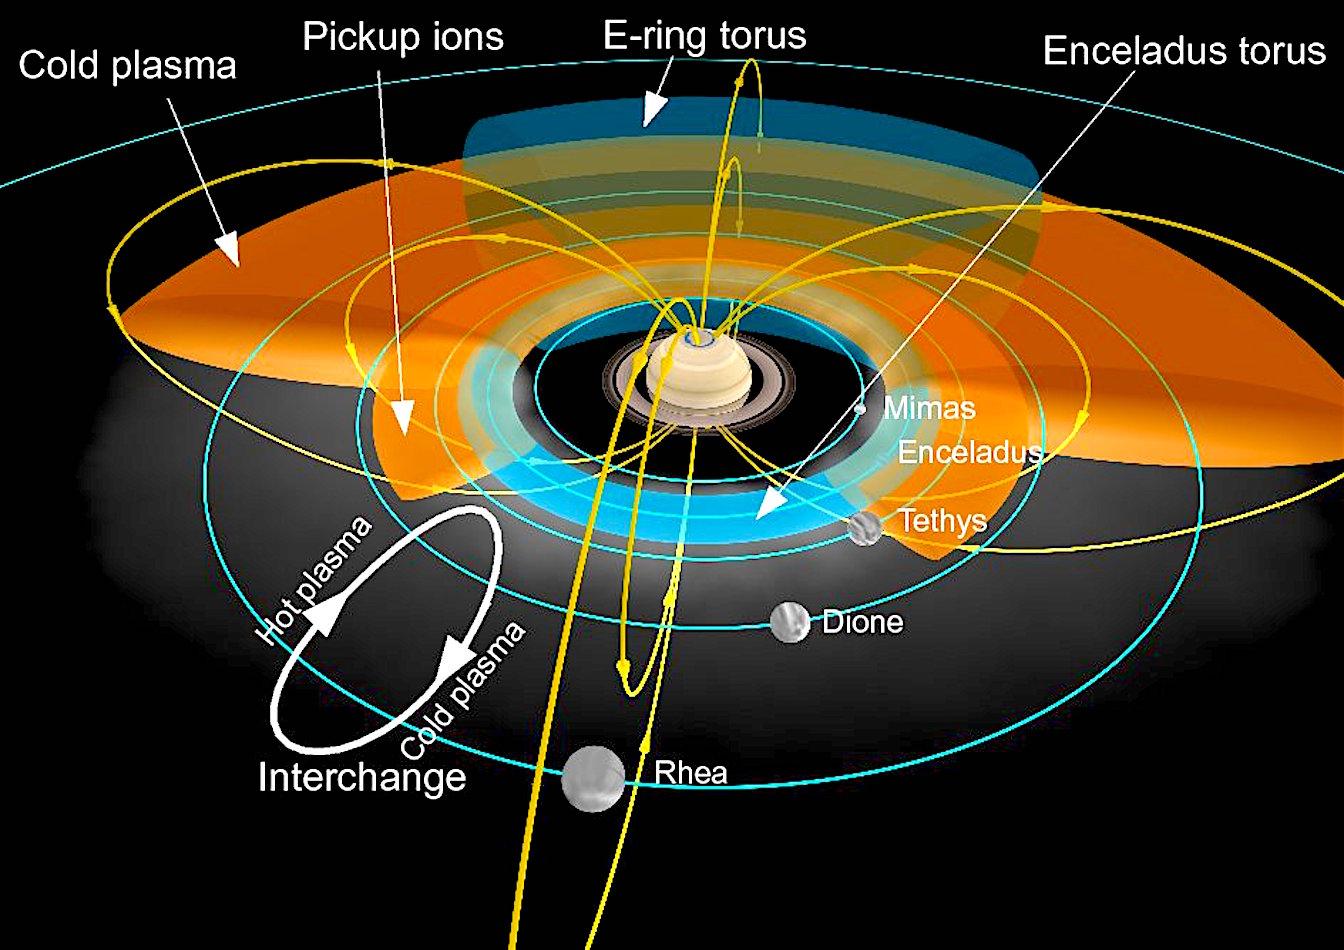 Domingos - Trocar ideias s/ teoria do Universo Elétrico - Página 2 Csa-mapping-plasmaprod